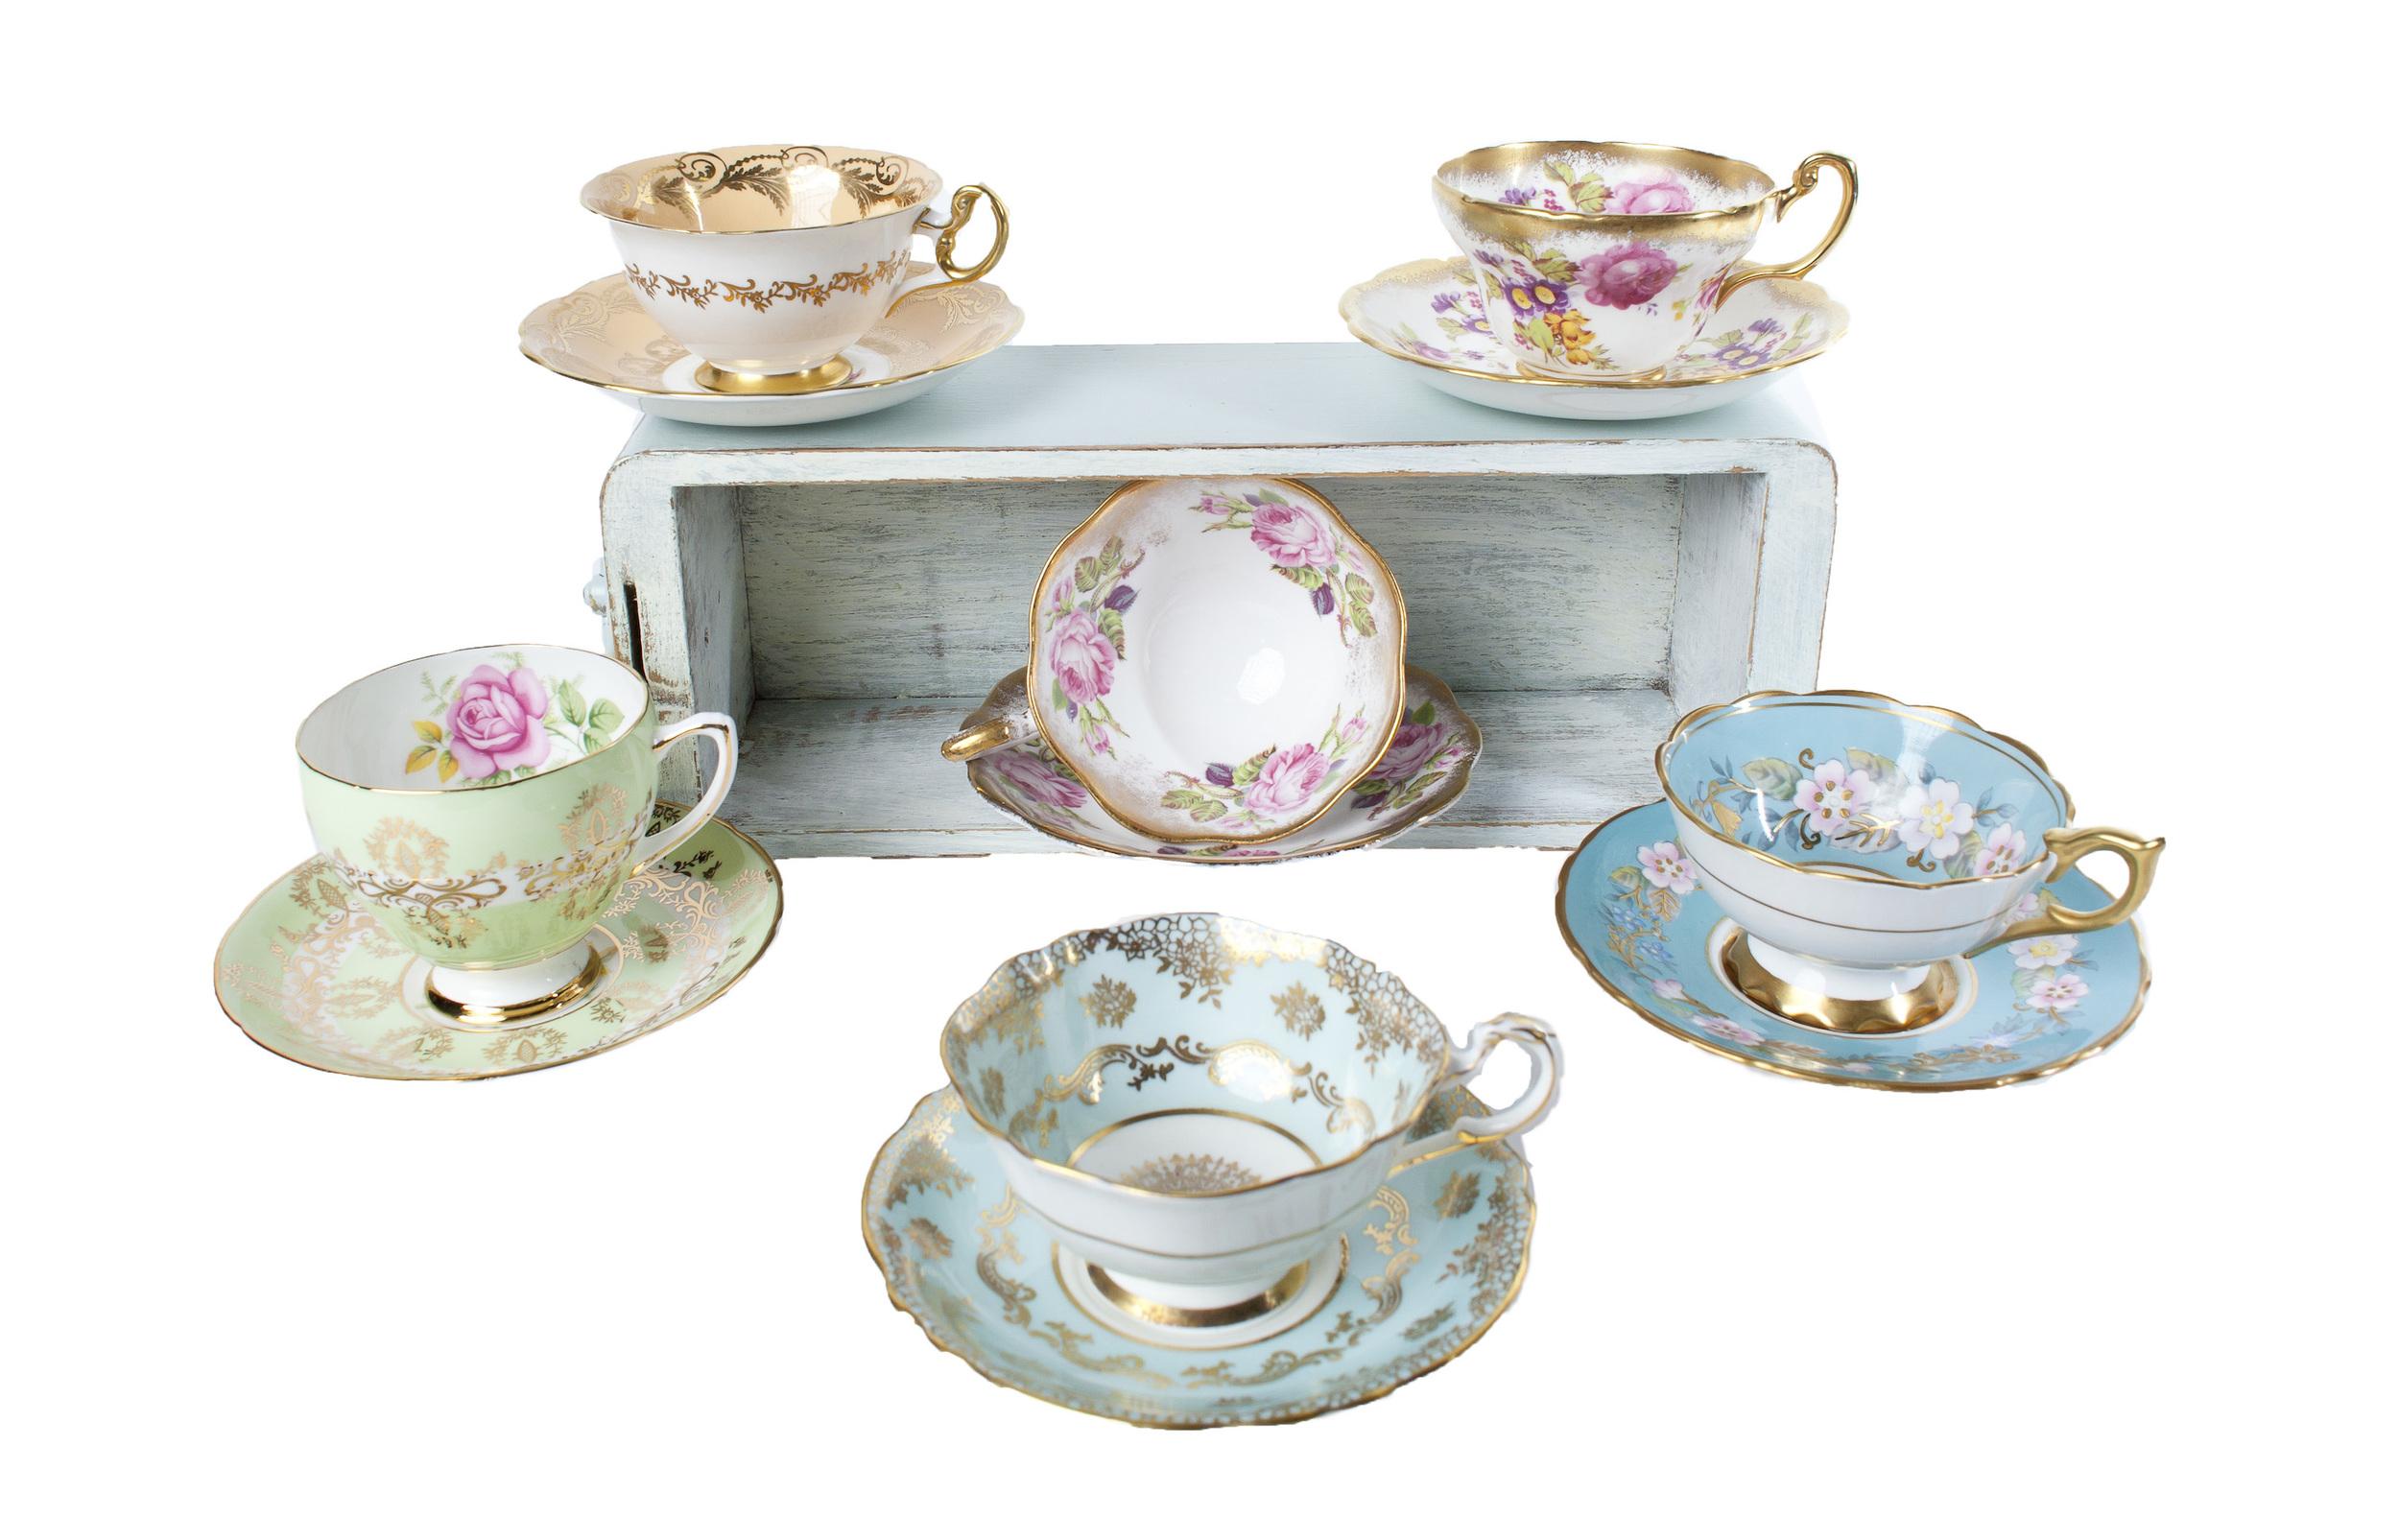 Assorted Teacups